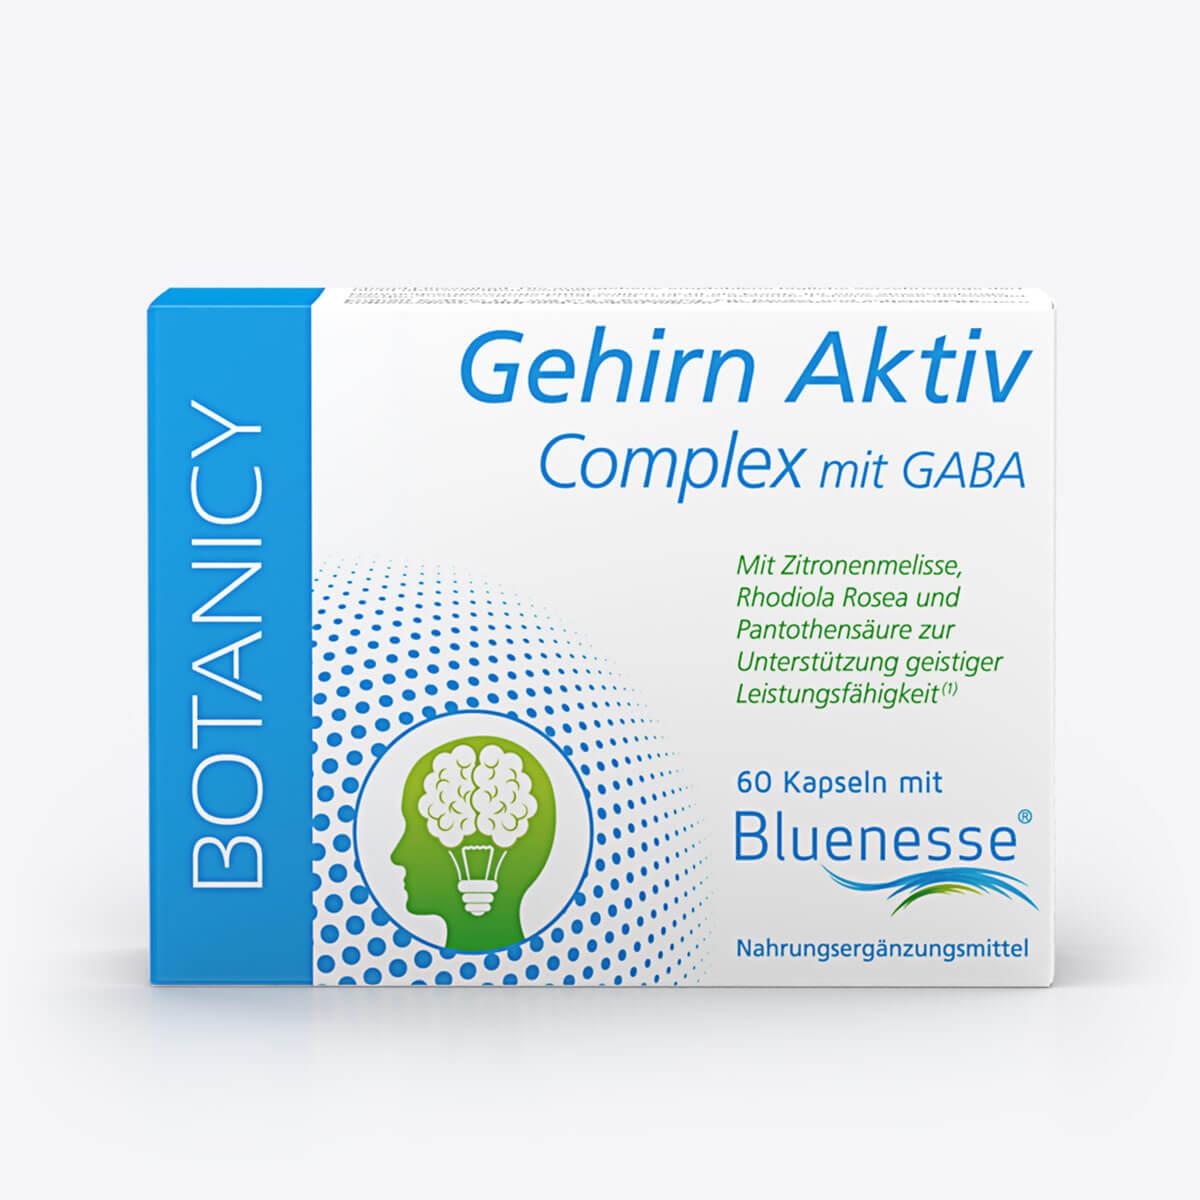 GEHIRN AKTIV Complex